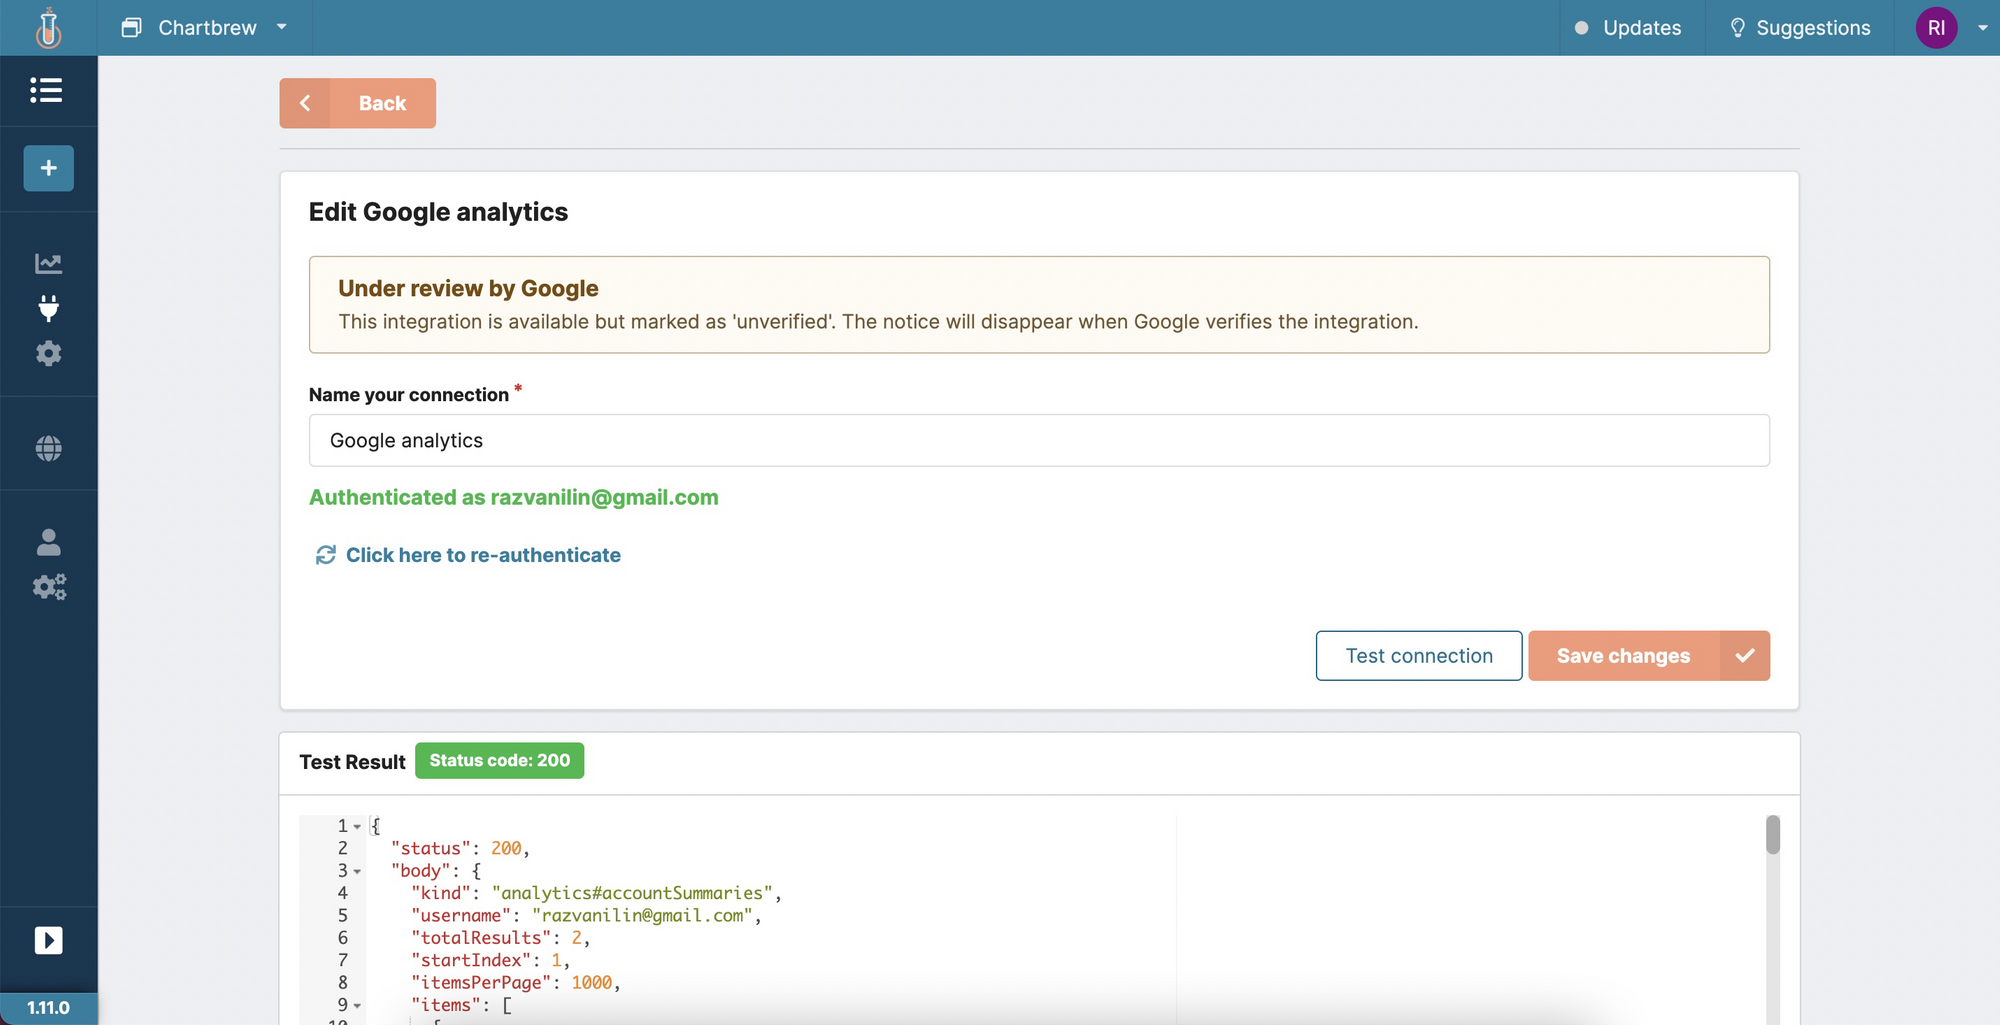 Google analytics integration with Chartbrew